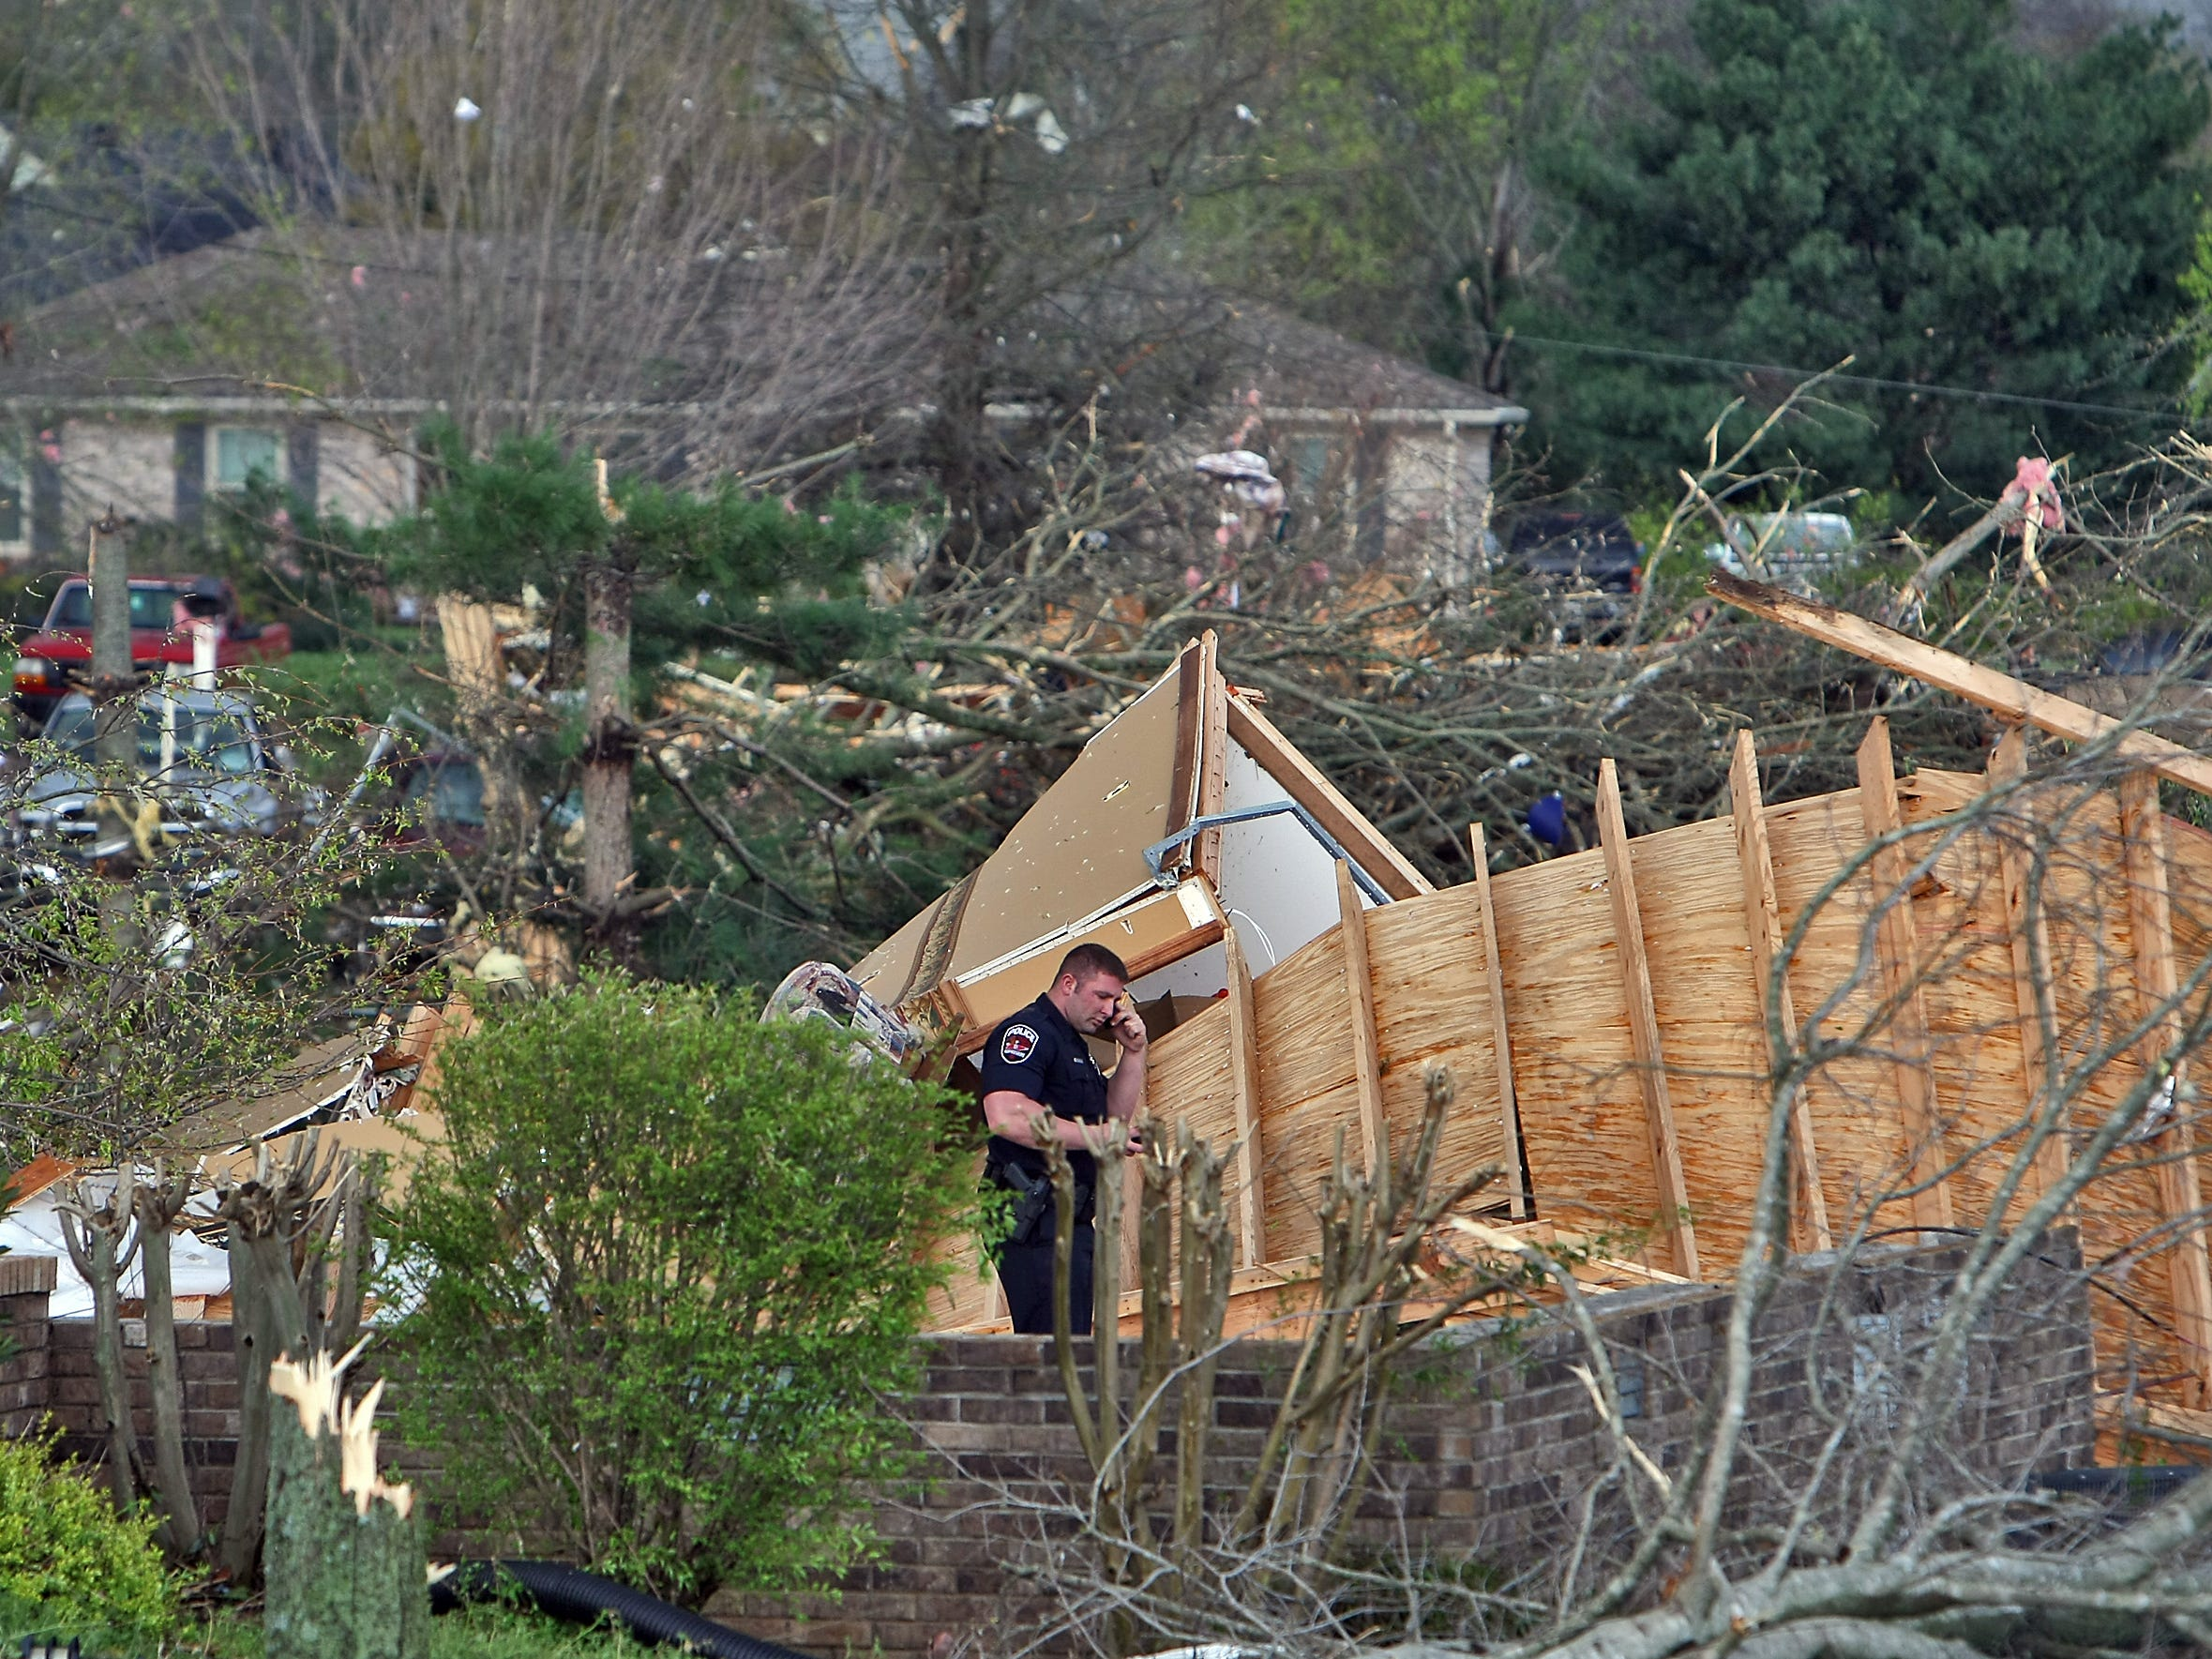 A Murfreesboro police officer surveys the area where tornado swept through on Manson Pike in Murfreesboro, Tenn., Friday, April 10, 2009. (JAE S. LEE / THE TENNESSEAN)